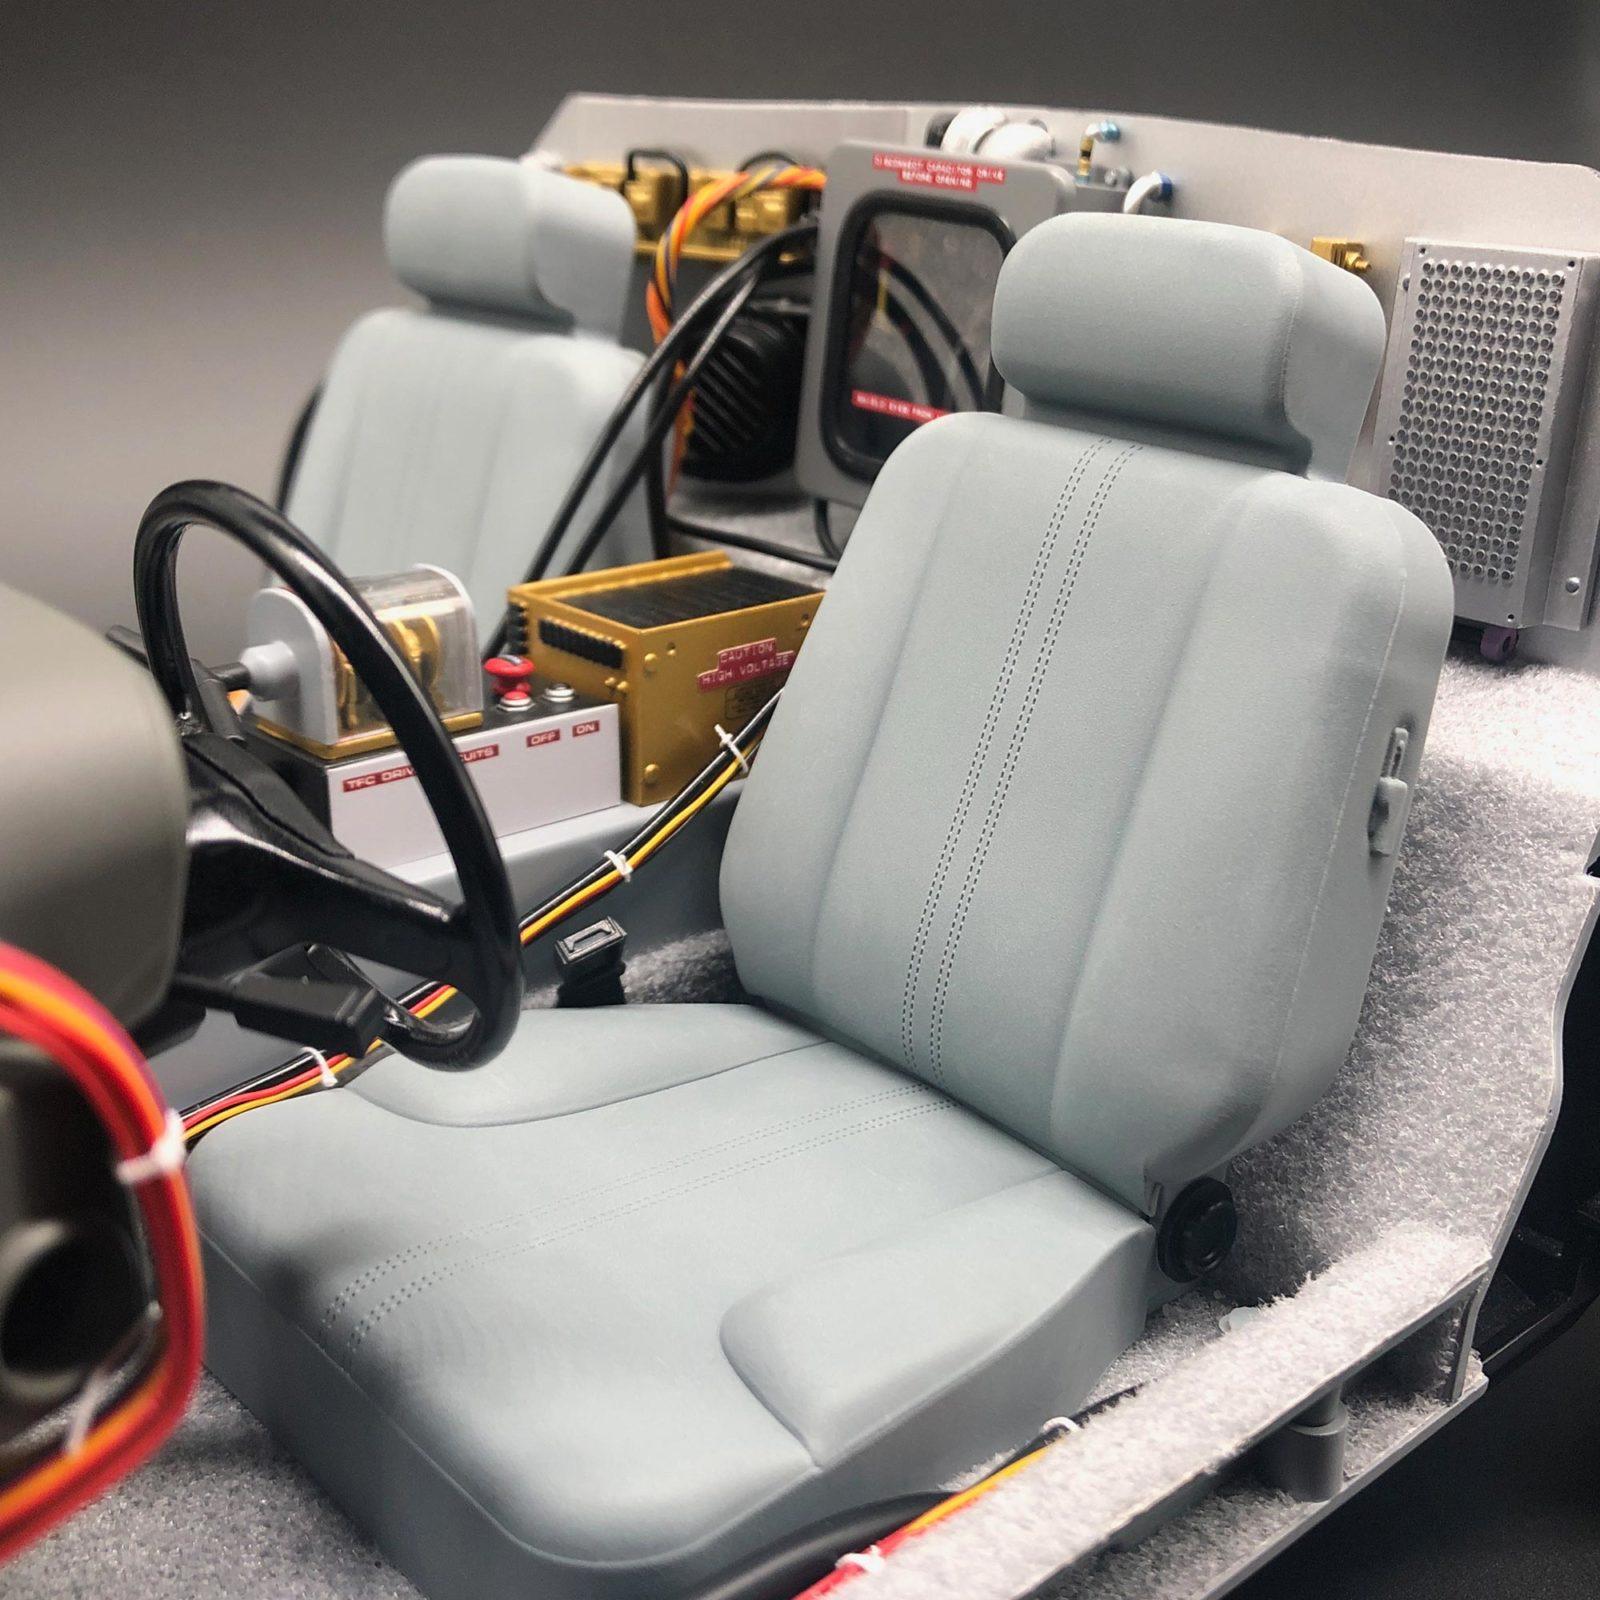 DeLorean Carpet mods fitted around seats